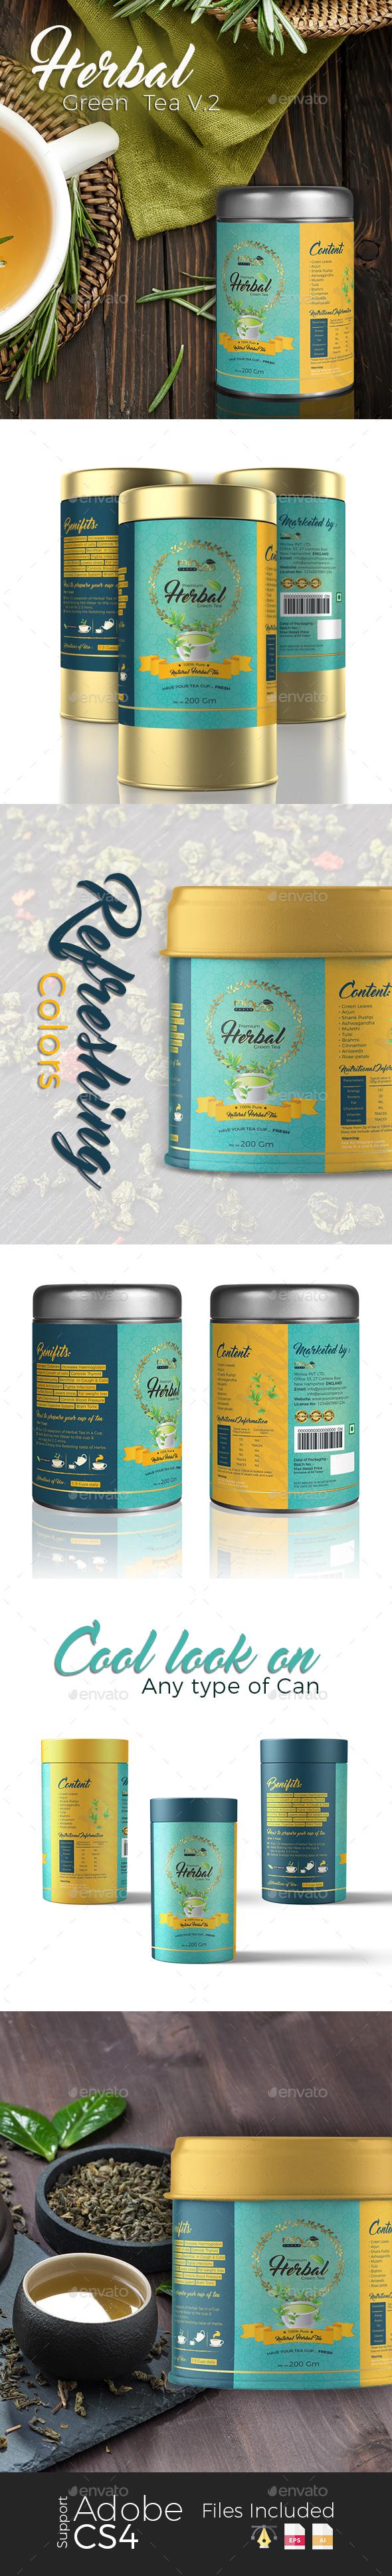 Herbal Green Tea Label V.2 - Packaging Print Templates